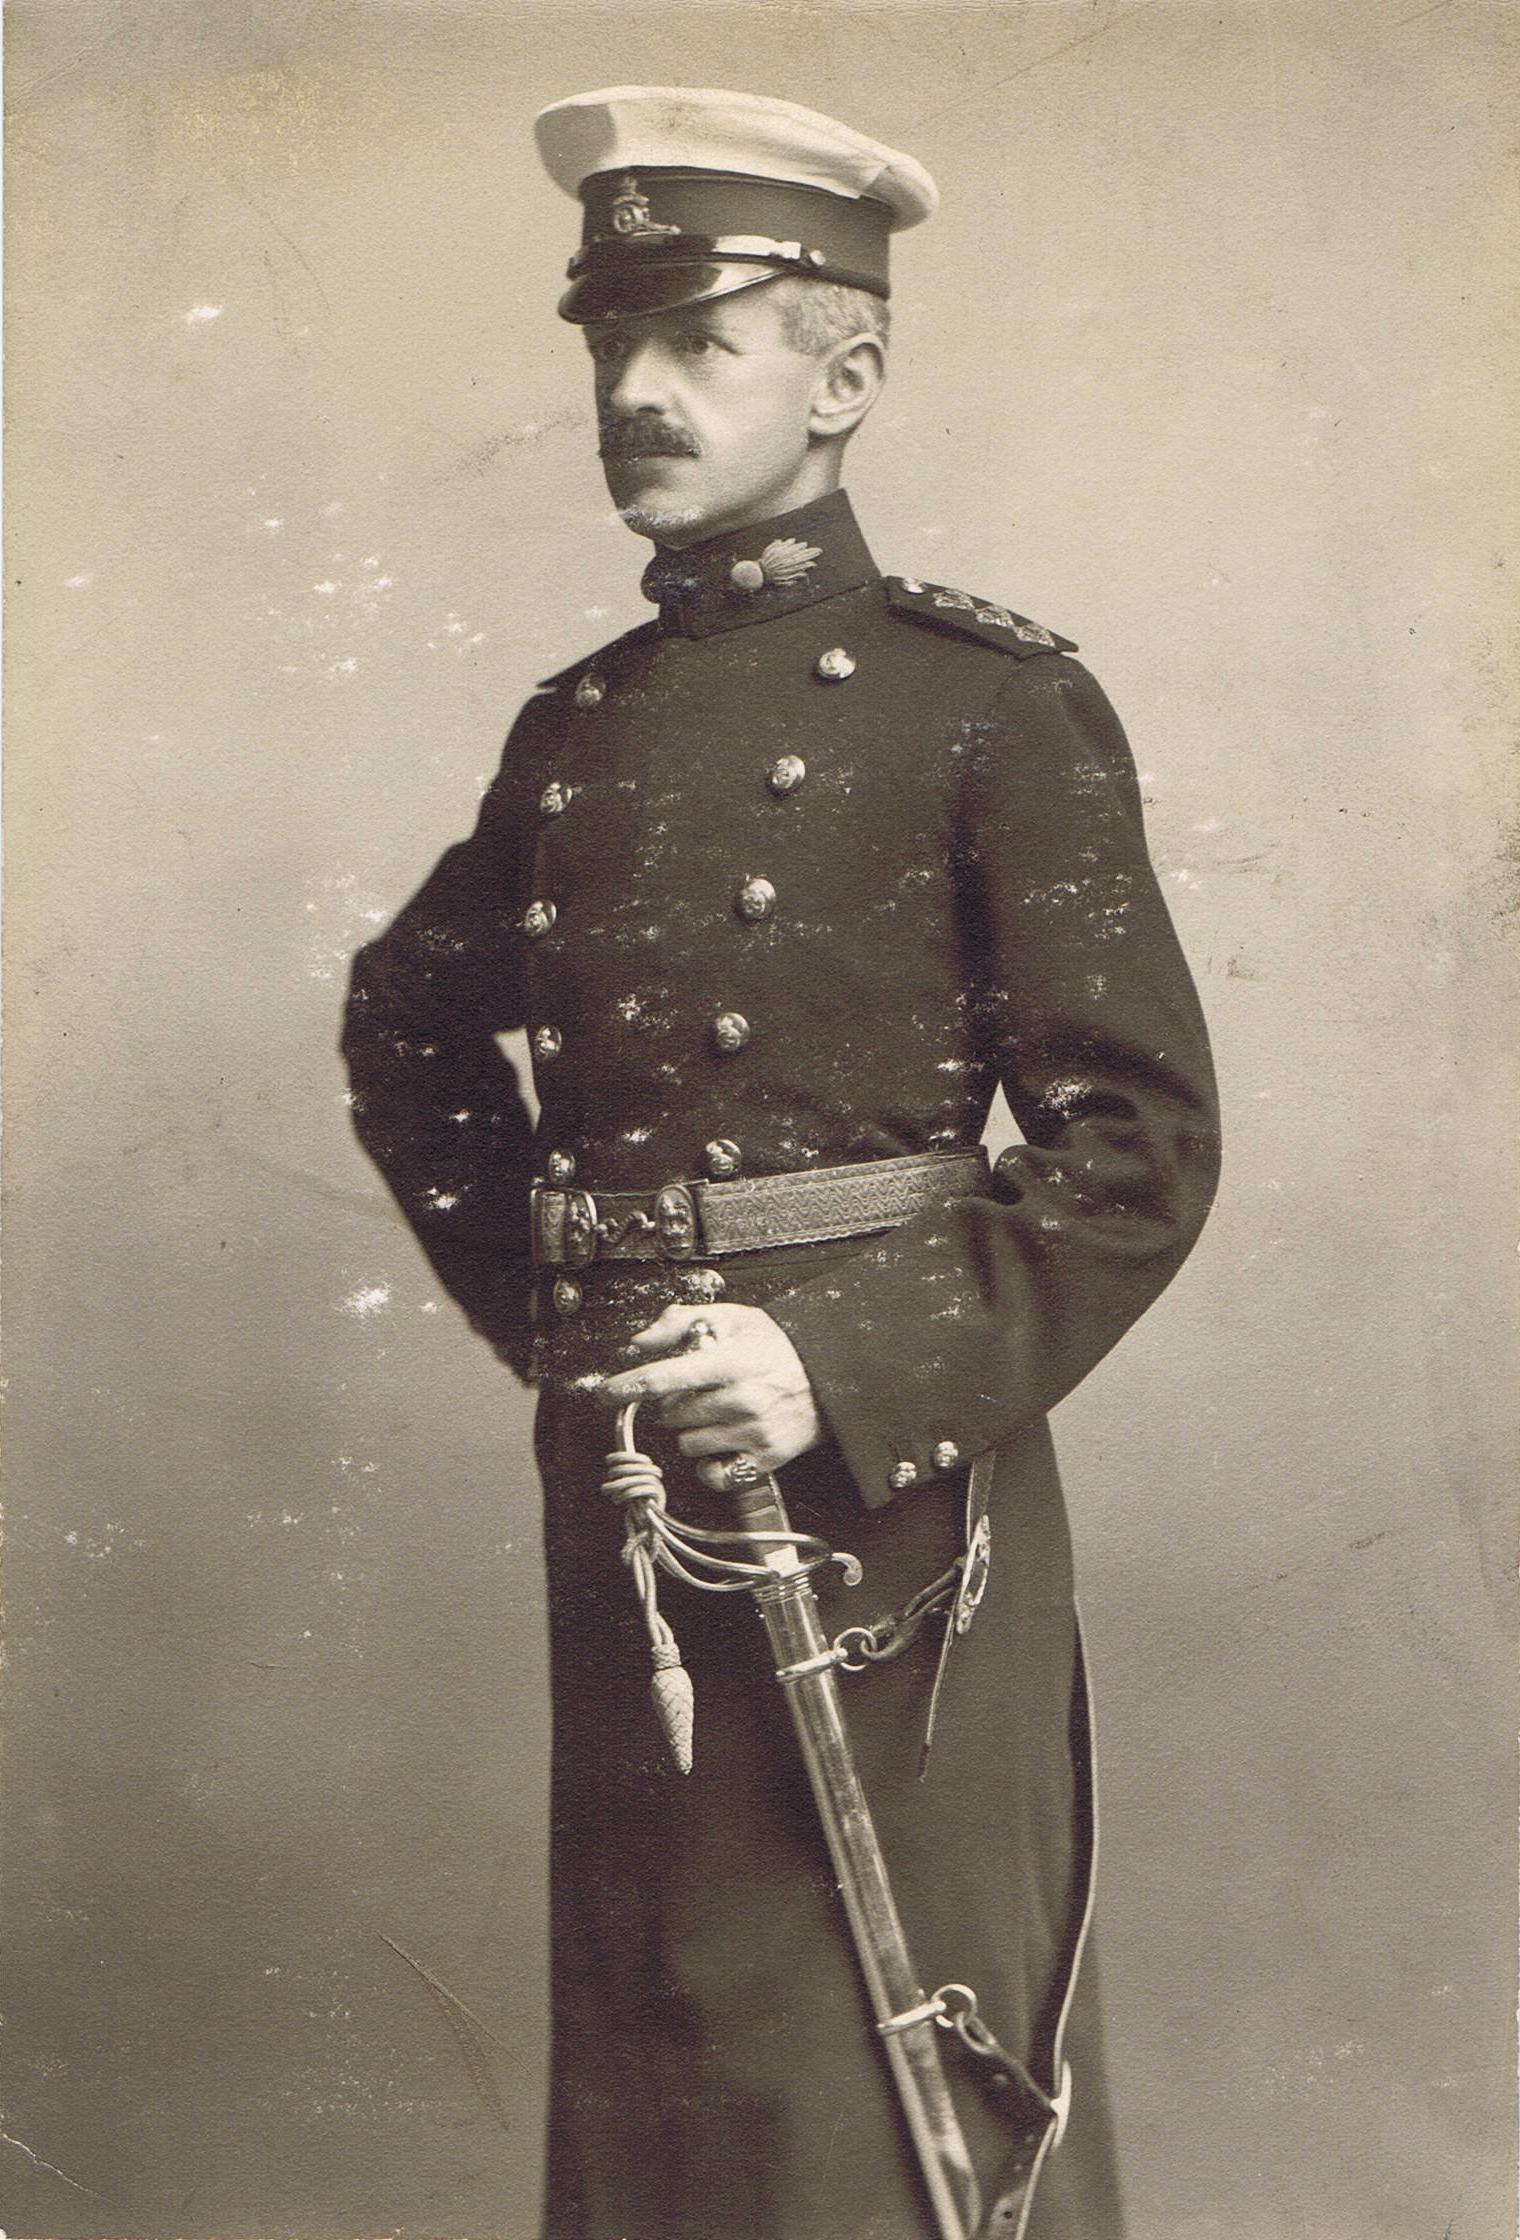 Captain R. Angus